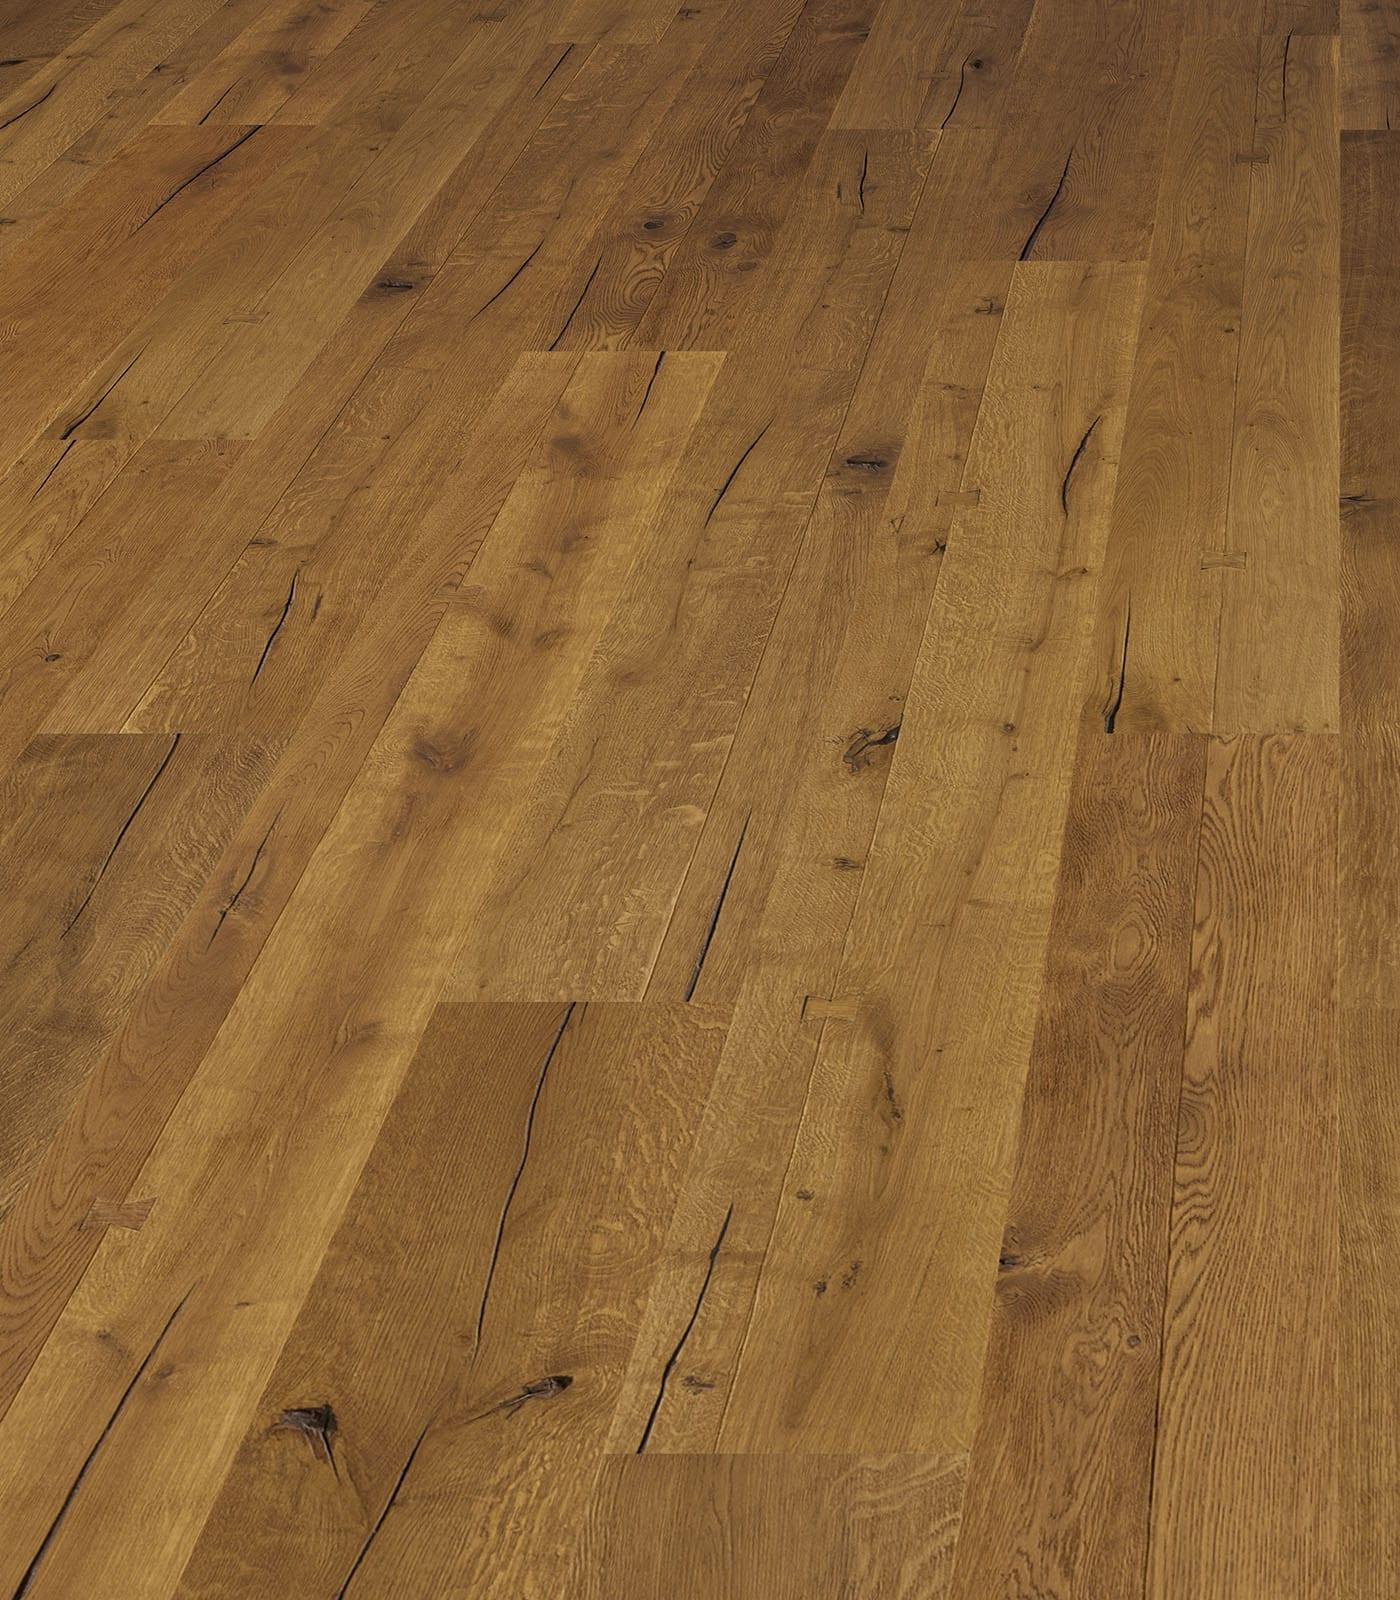 Balmoral-European Oak Floors-Heritage Collection-angle